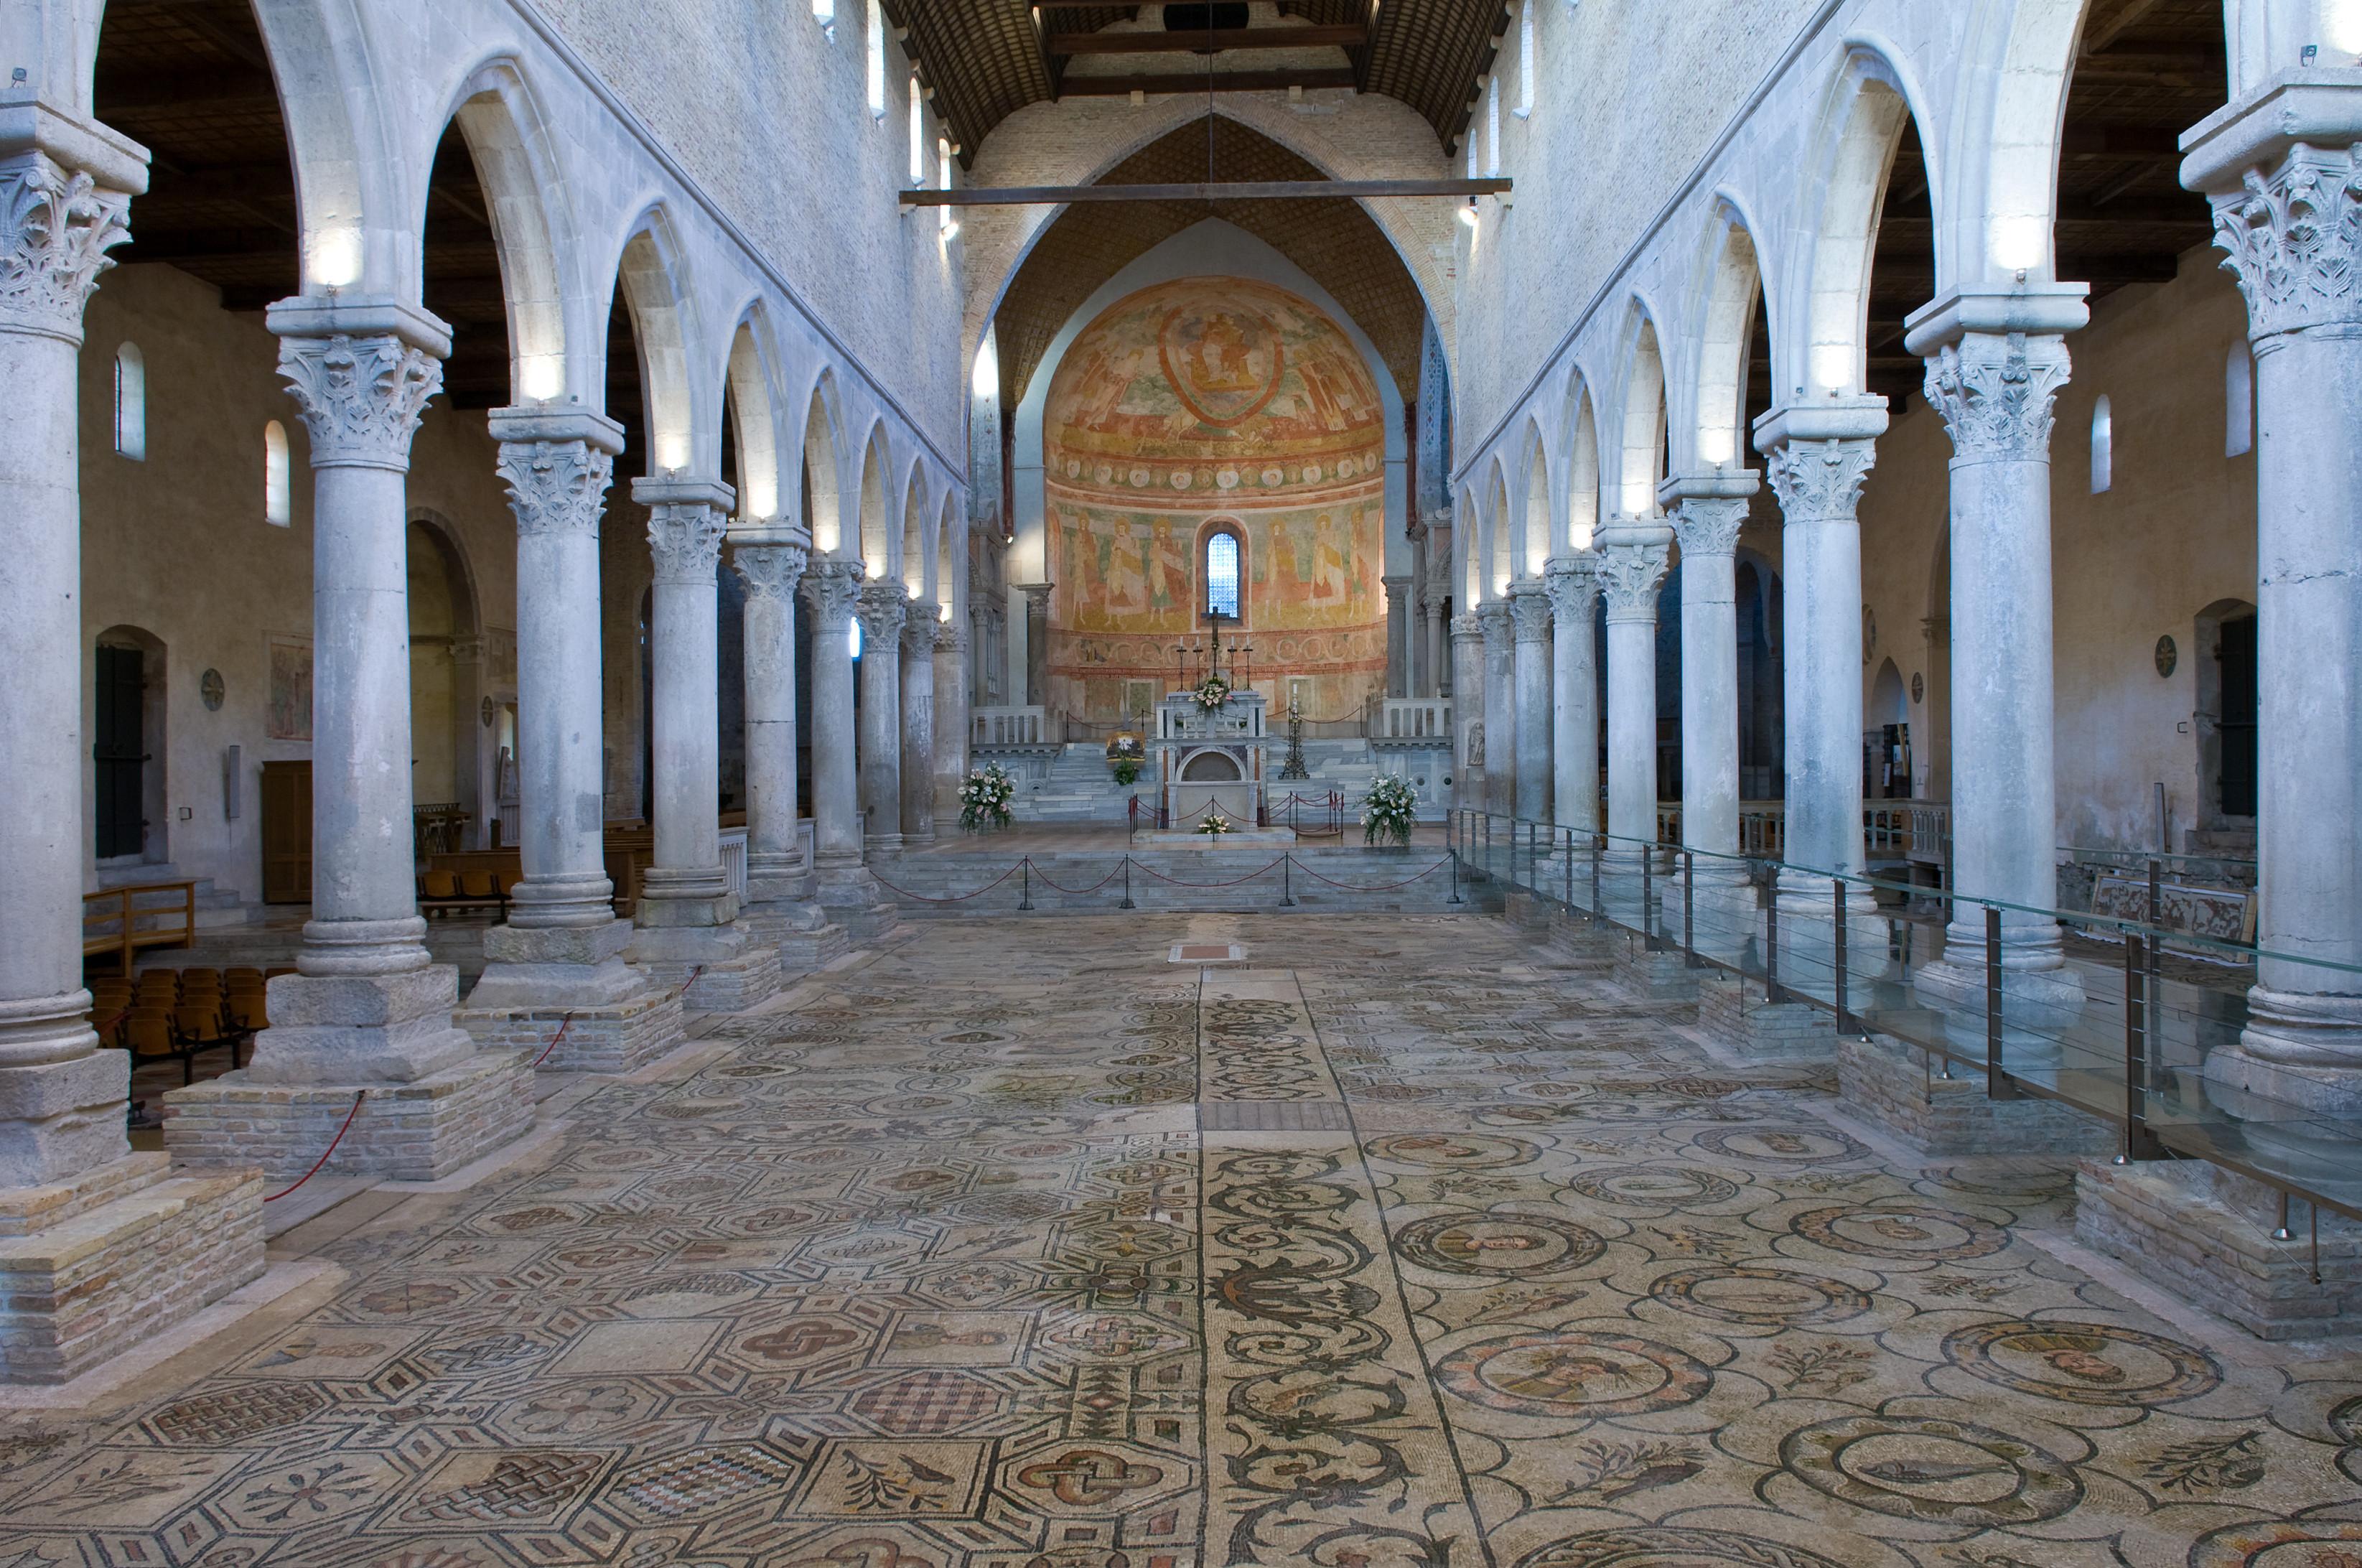 aquileia_basilica_interno-navata_foto-g-baronchelli